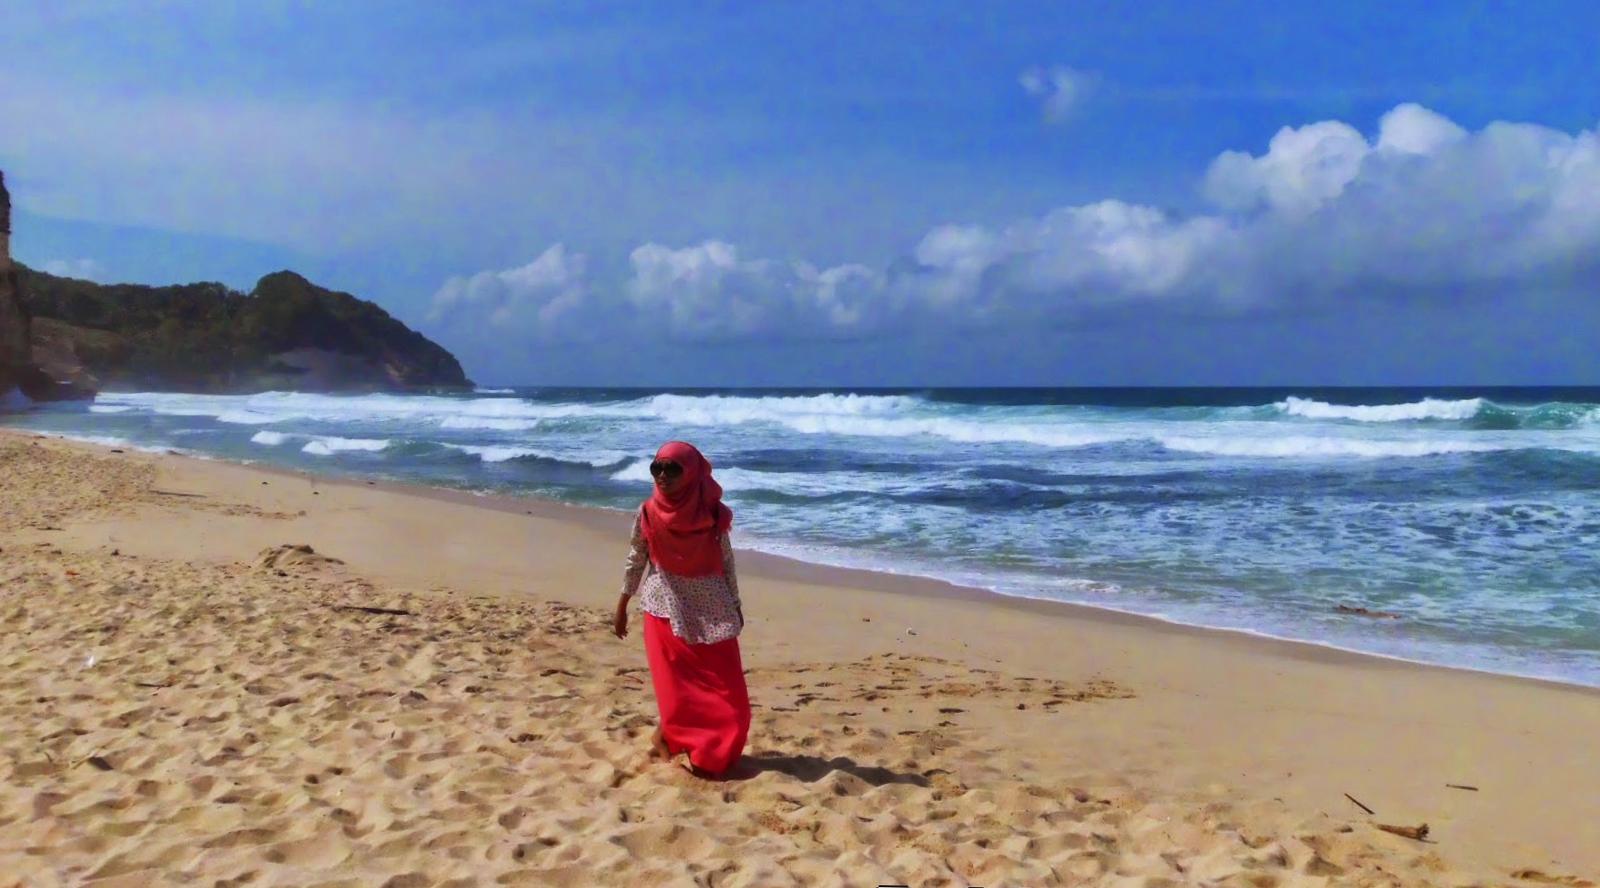 lokasi pantai buyutan pacitan jawa timur pantai buyutan kabupaten pacitan jawa timur indonesia